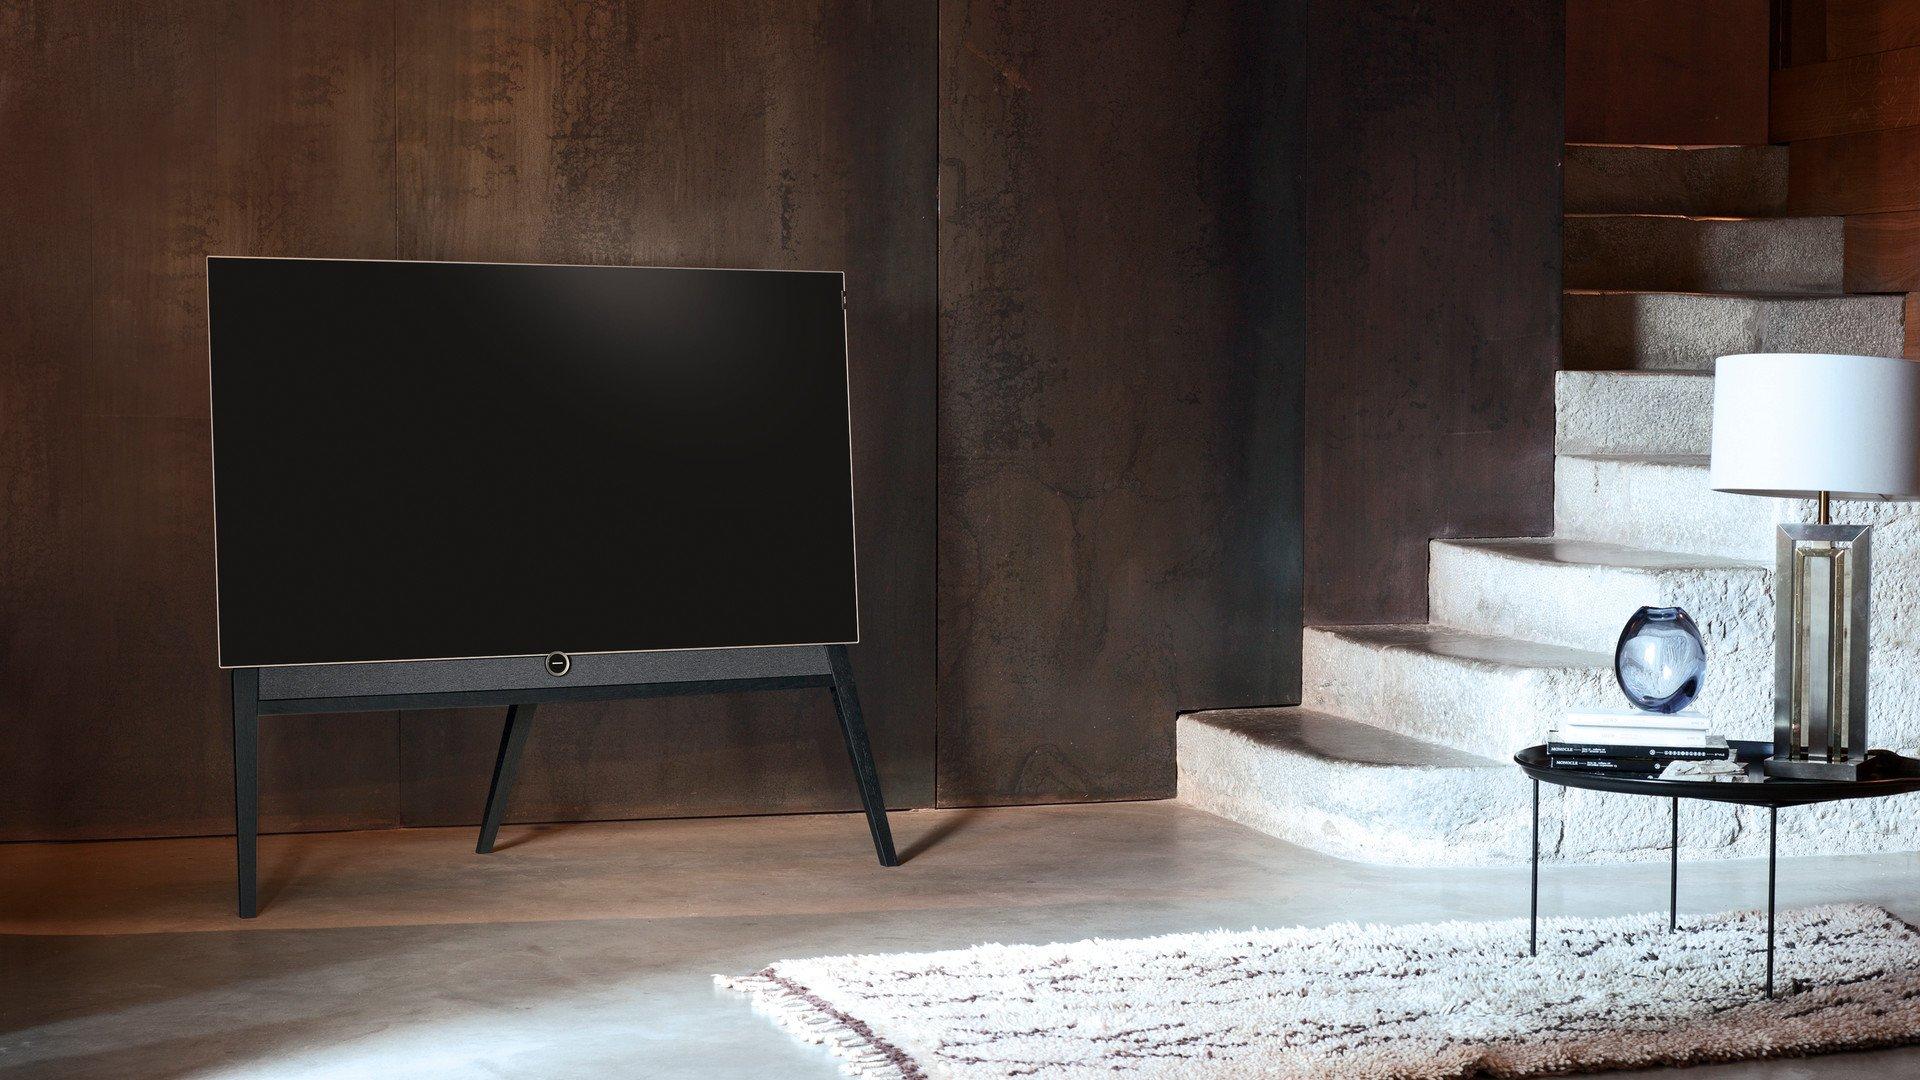 telewizory loewe białystok